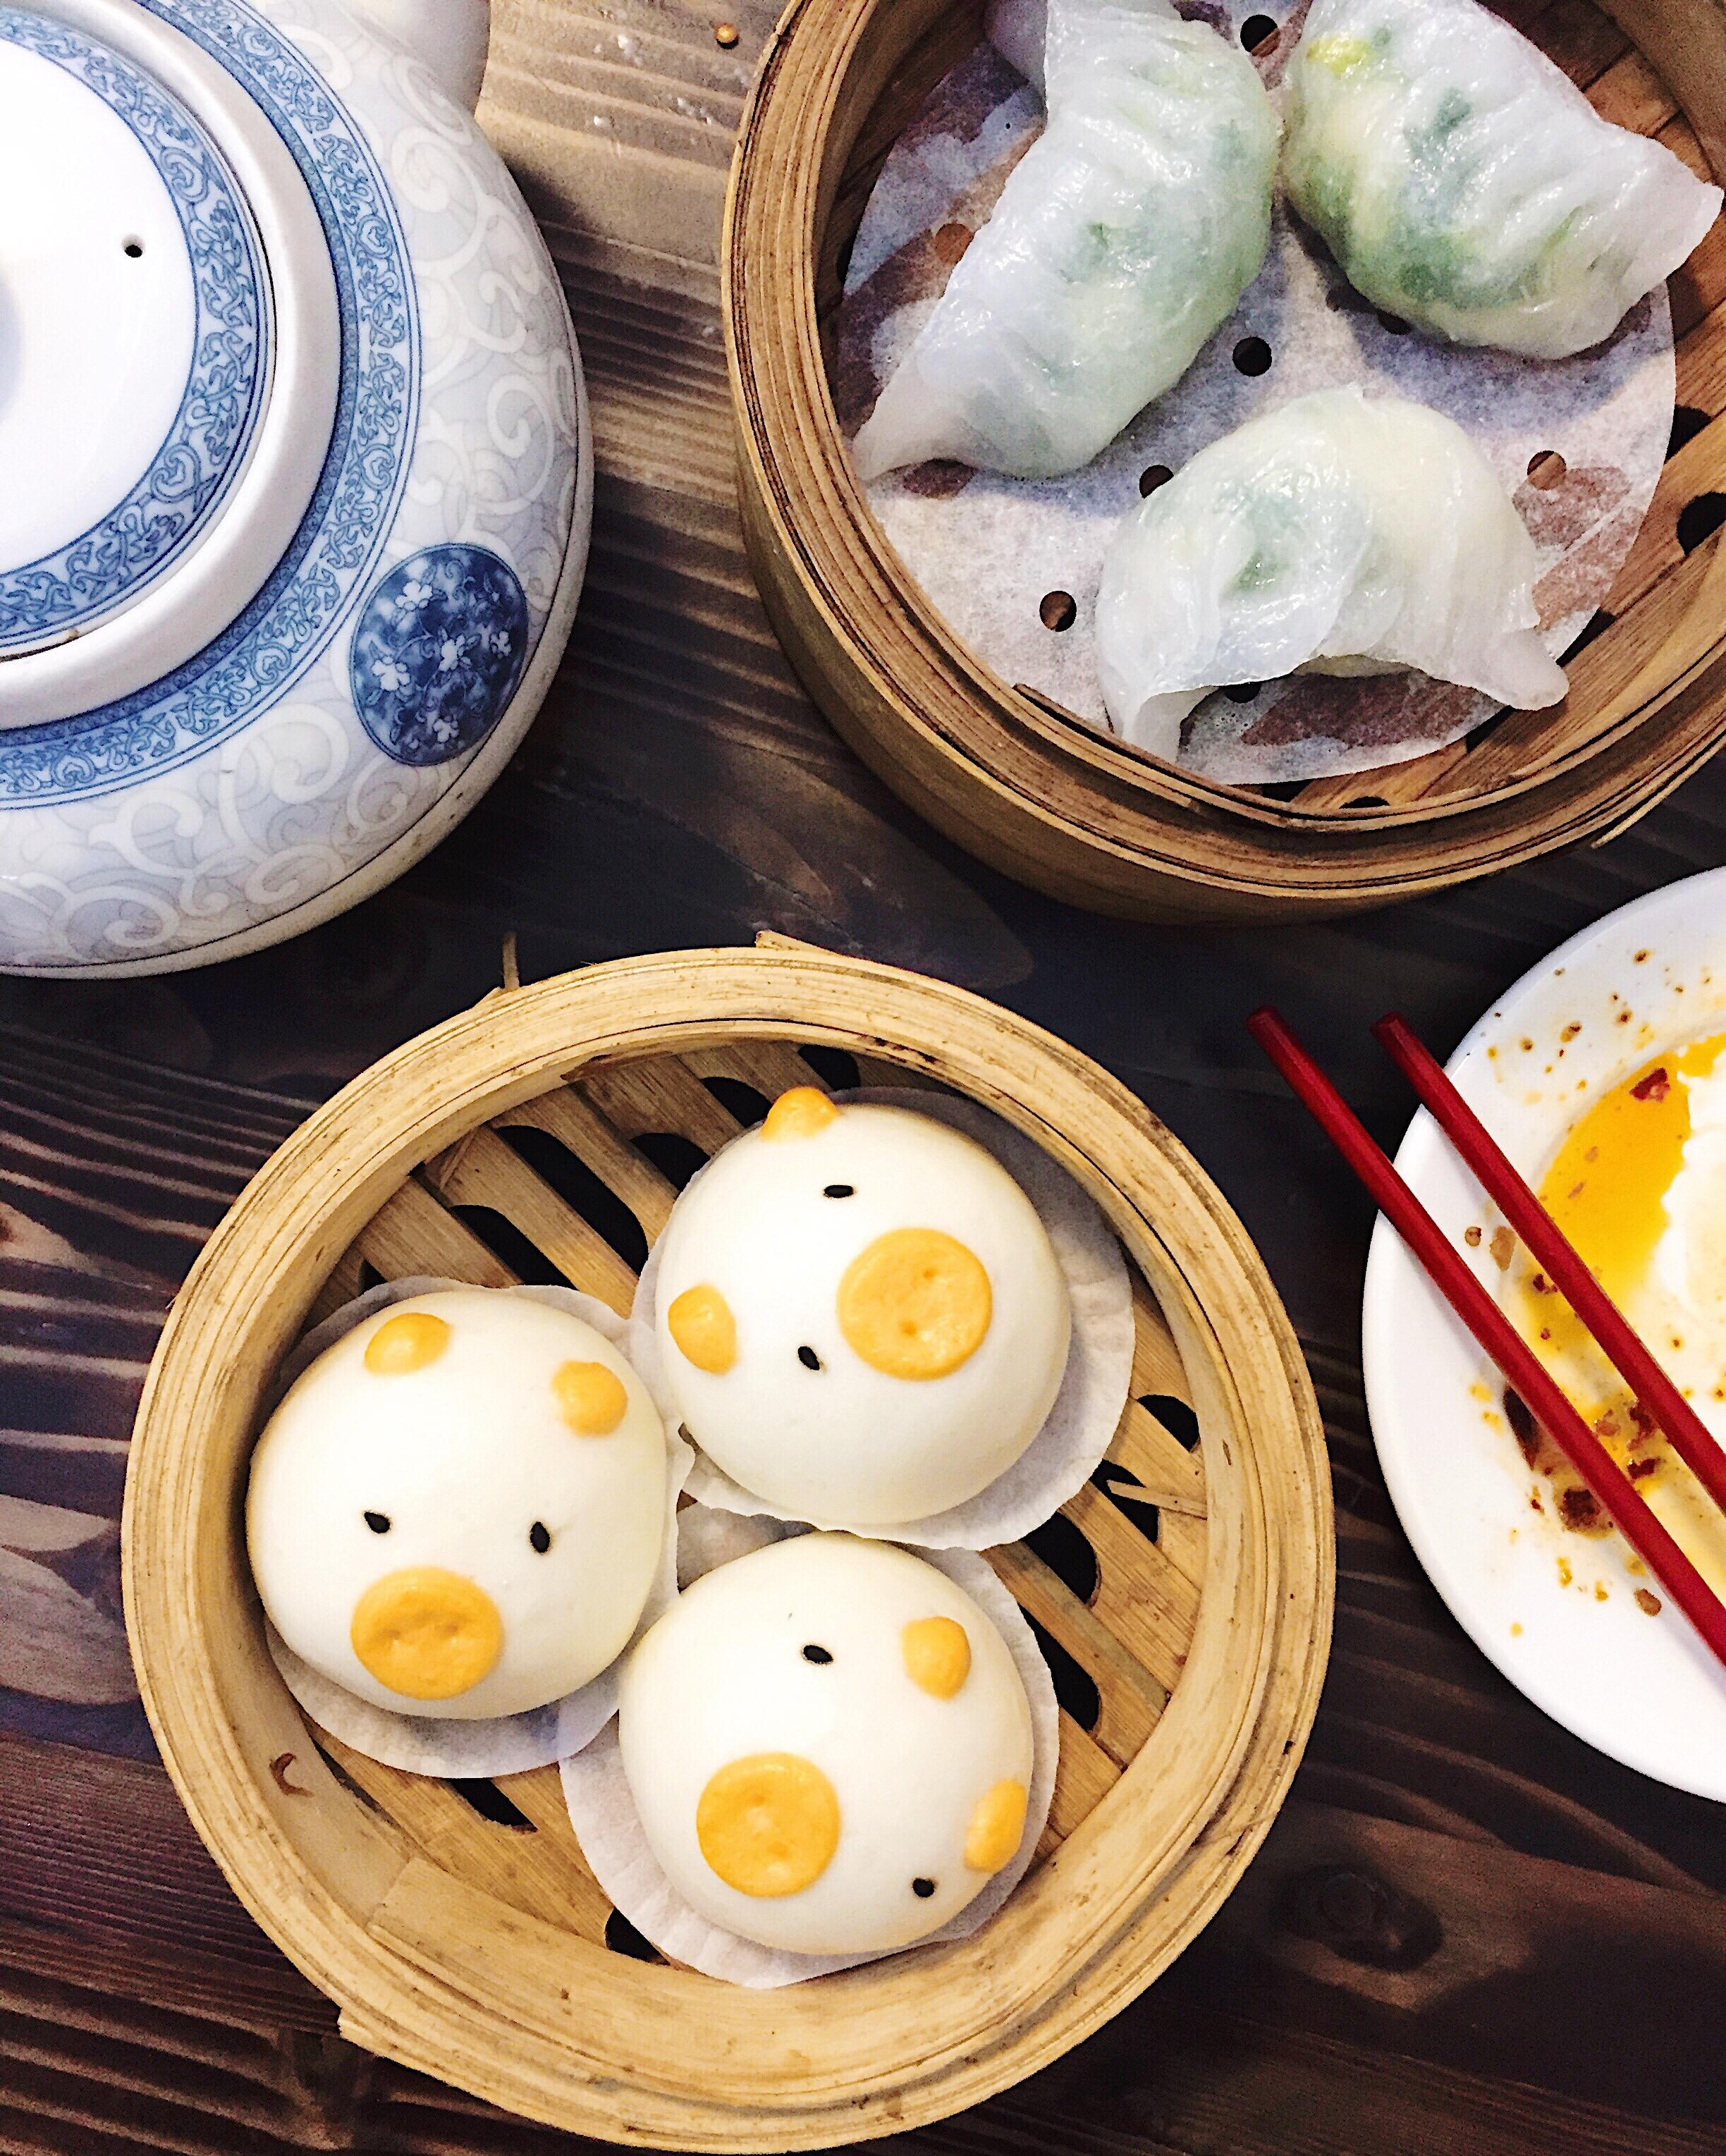 amy_chen_design_chinatown_nyc_food_guide_dim_sum_vip.jpg